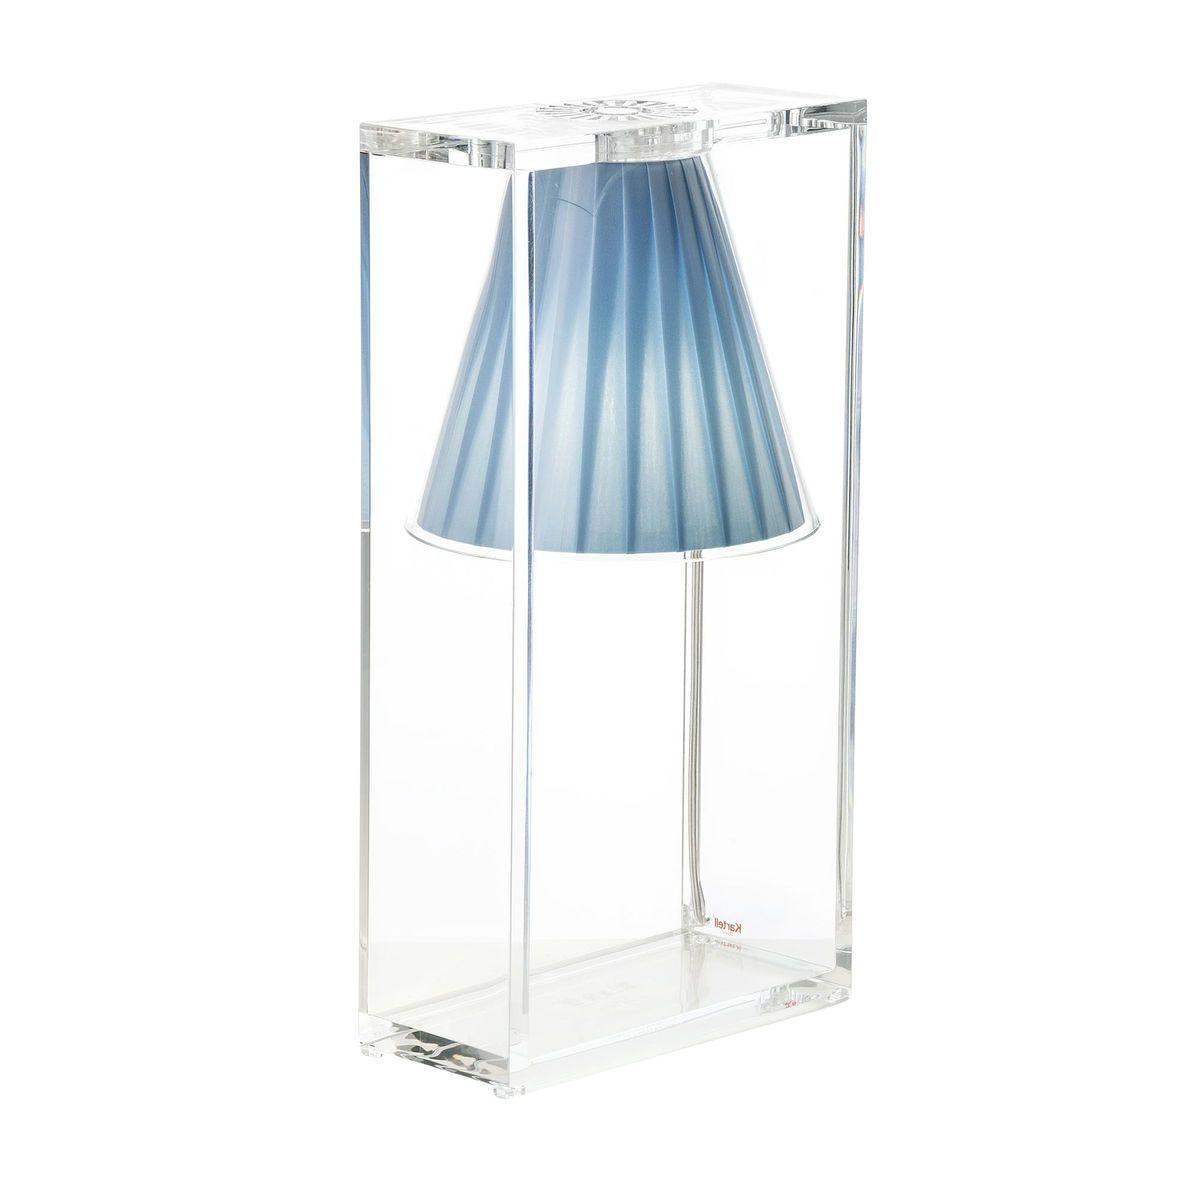 light air lampe de table abat jour tissu kartell. Black Bedroom Furniture Sets. Home Design Ideas